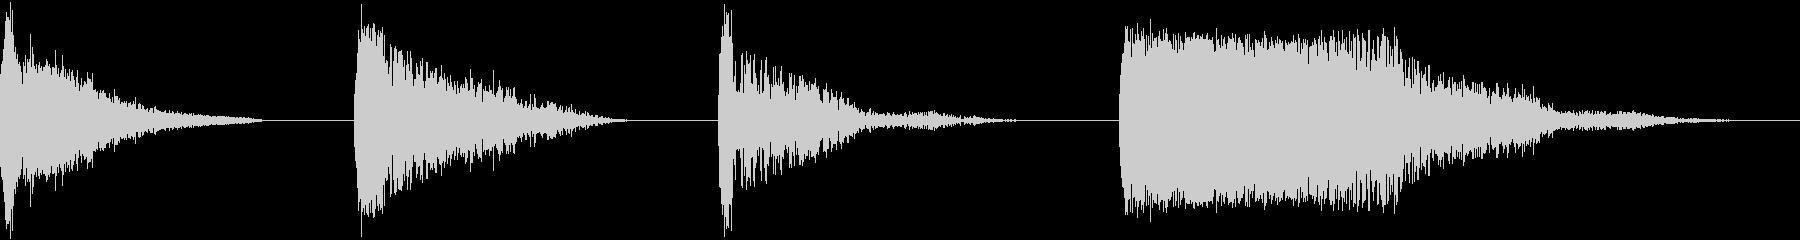 HARMOHIT、4バージョン、イ...の未再生の波形